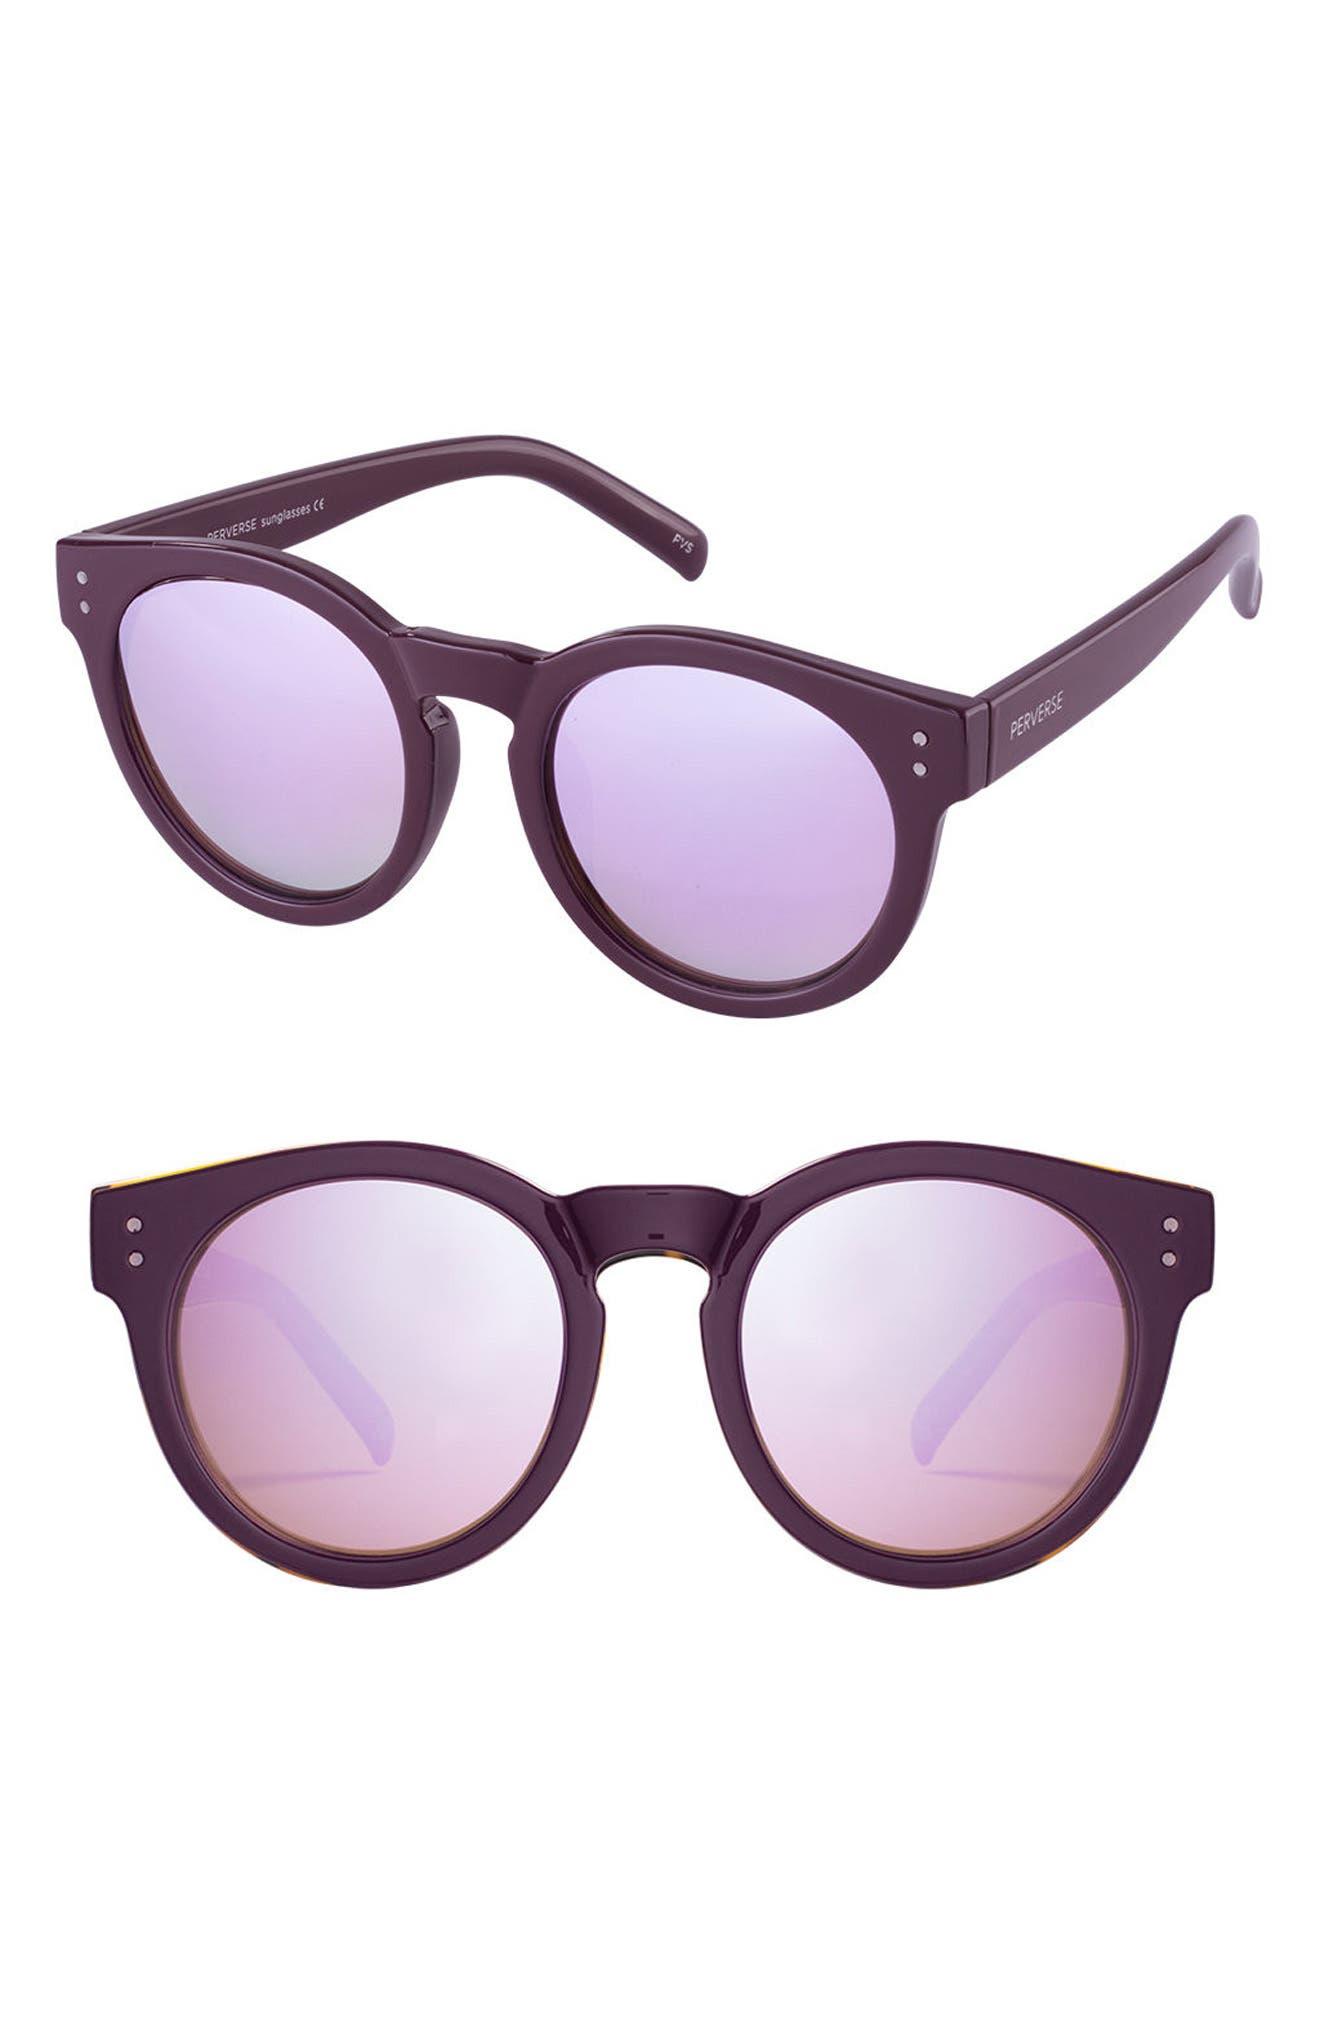 PERVERSE Declan 51mm Keyhole Sunglasses